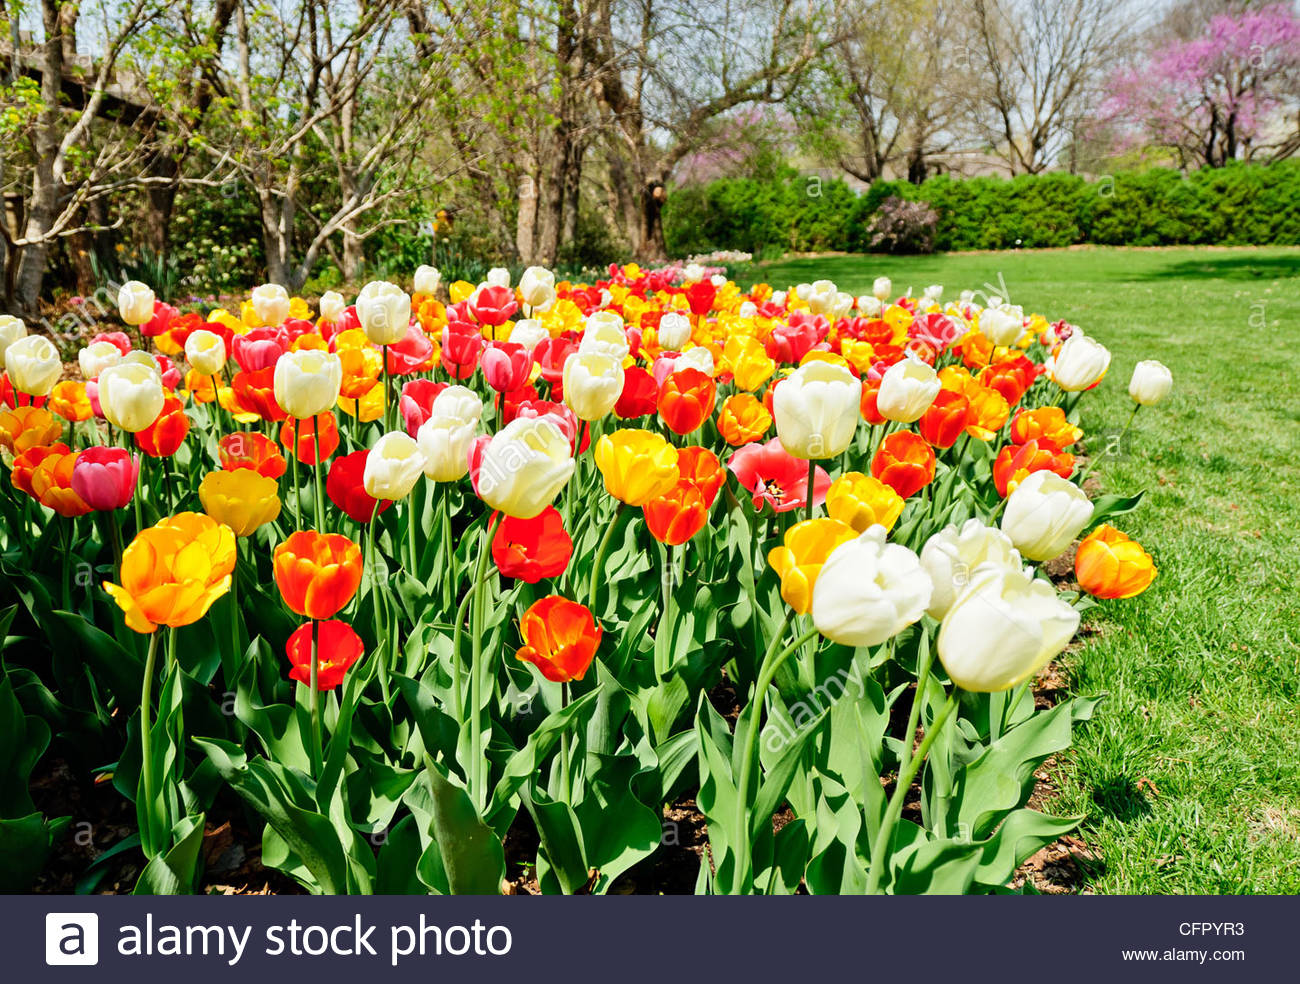 Muti-Colored Tulips, Botanica Gardens, Wichita, KS., April 9, 2011 - Stock Image